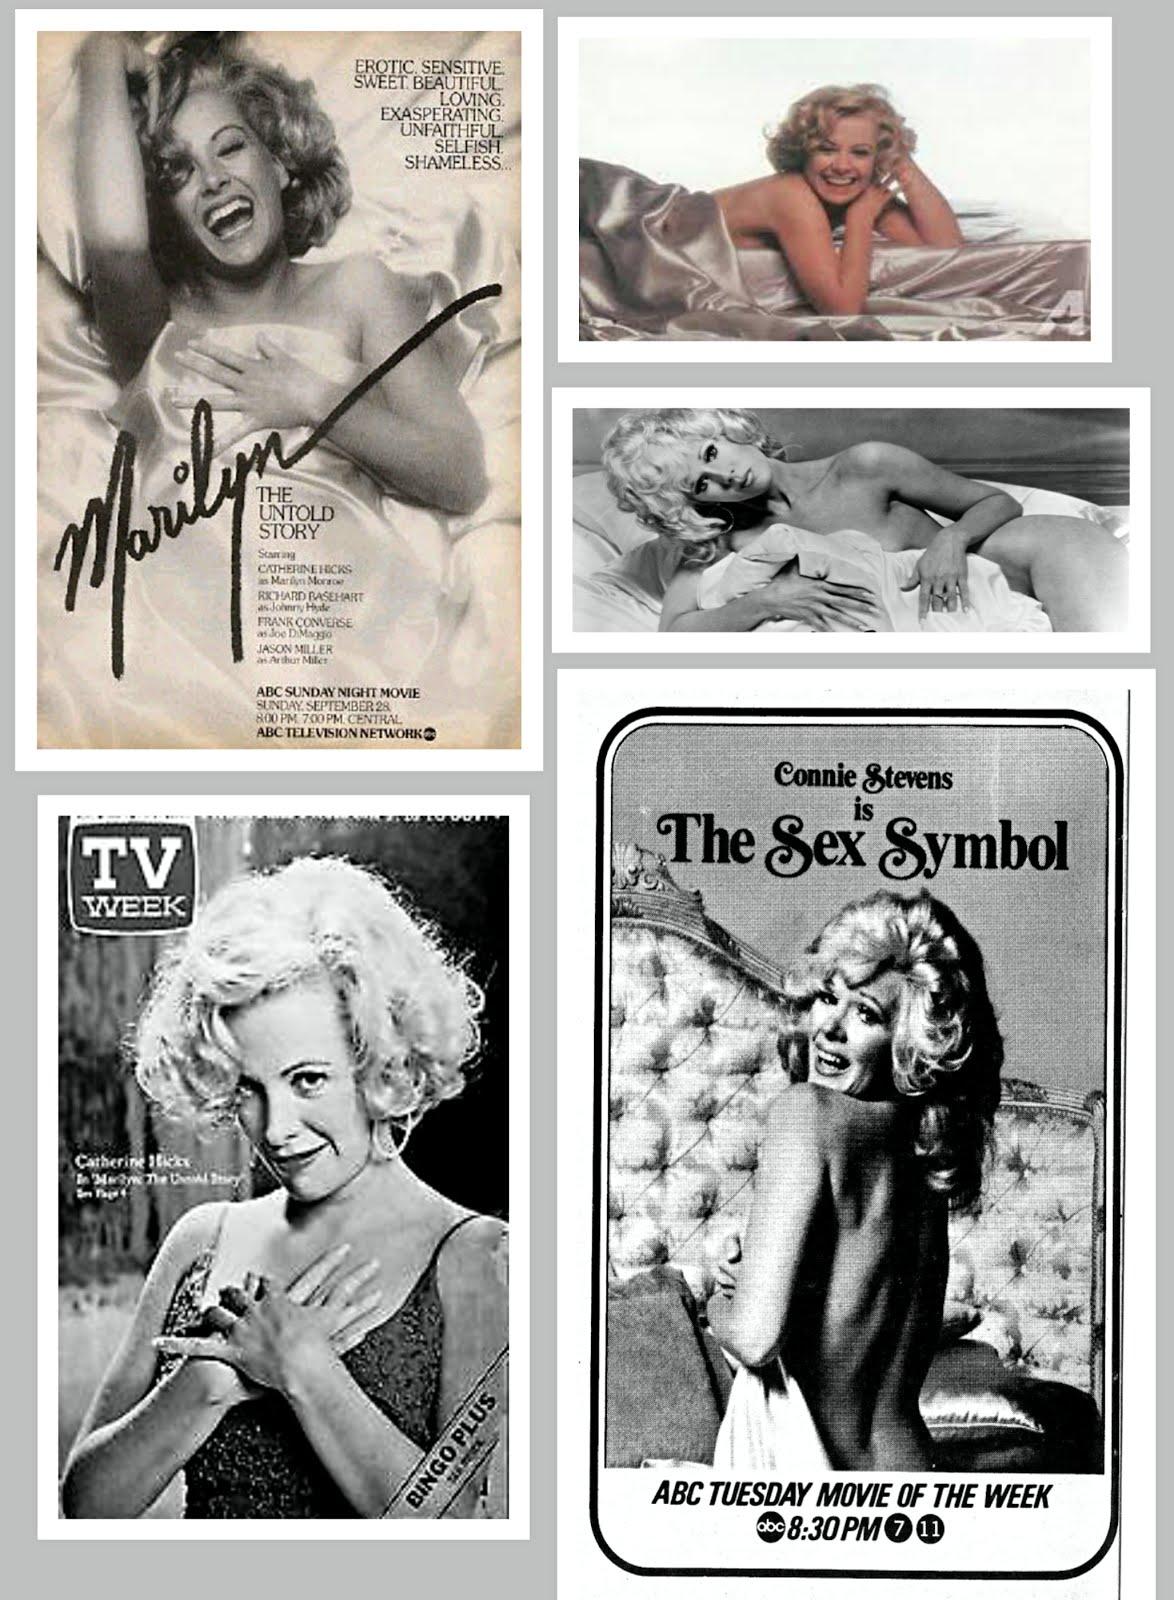 Connie Stevens, Catherine Hicks MARILYN MONROE, The Sex Symbol - 2 TV bio film DVDs